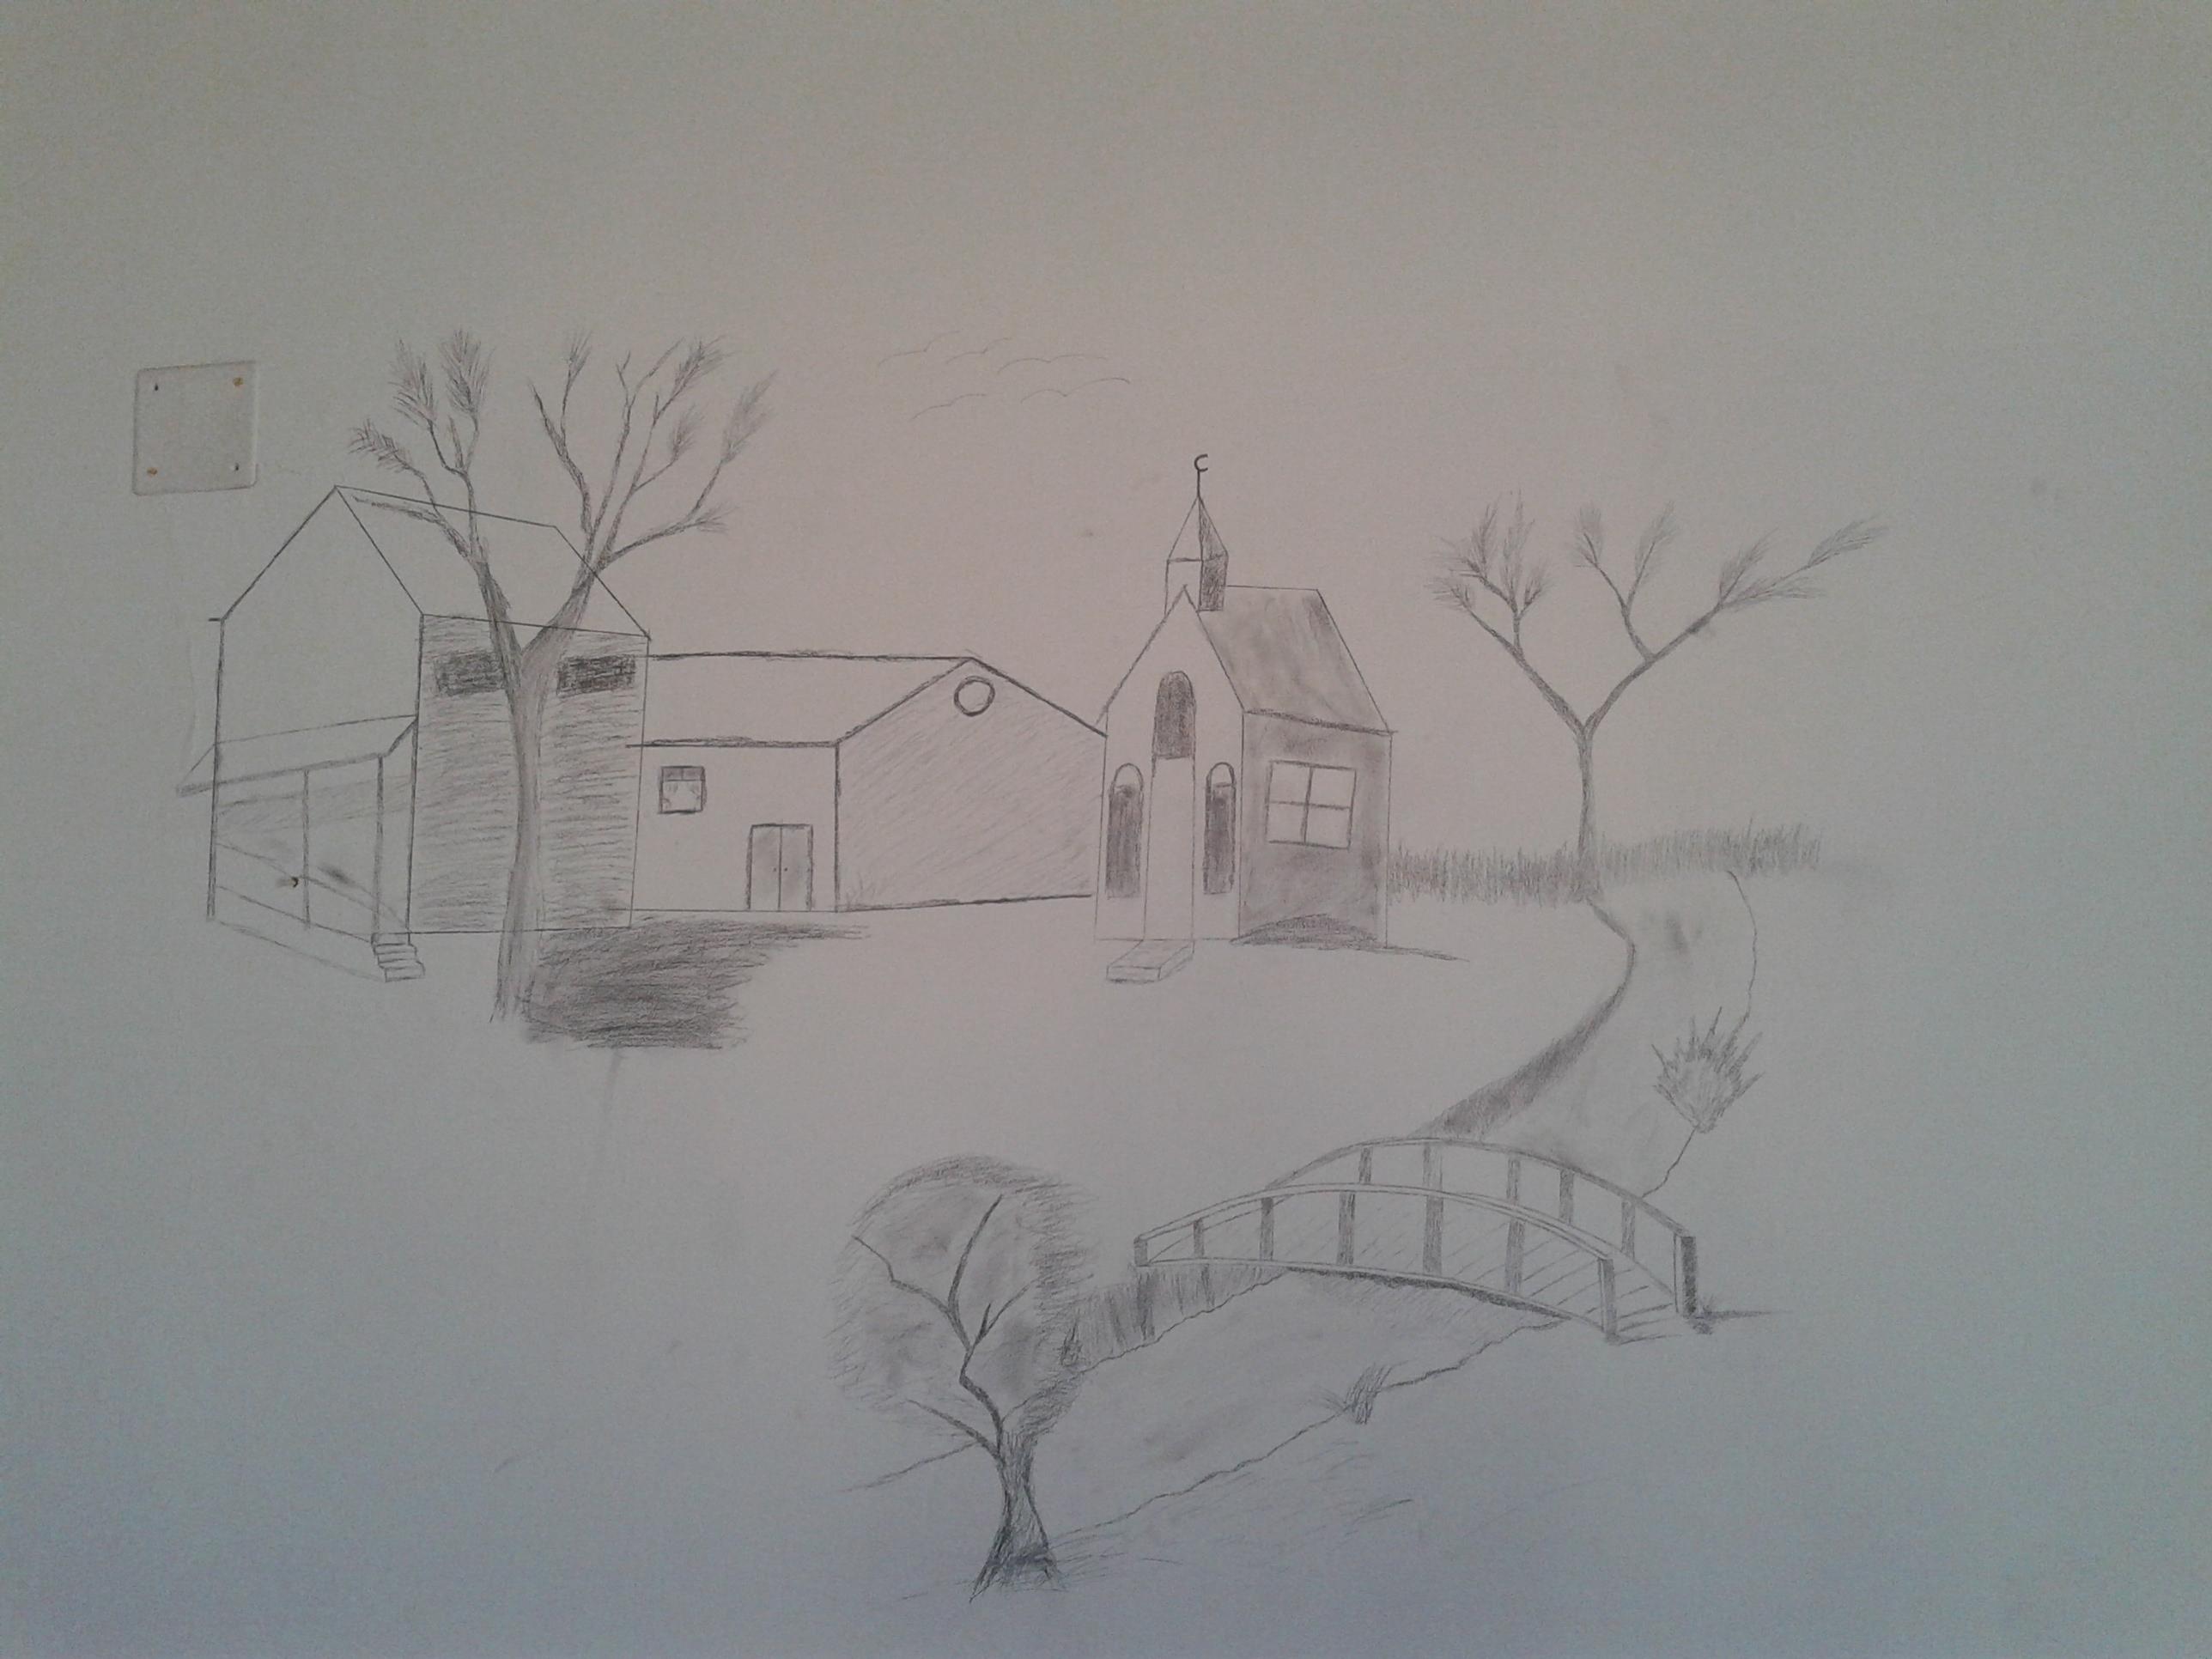 بالصور رسم سهل جدا , تعلم الرسم السهل جدا 3594 8